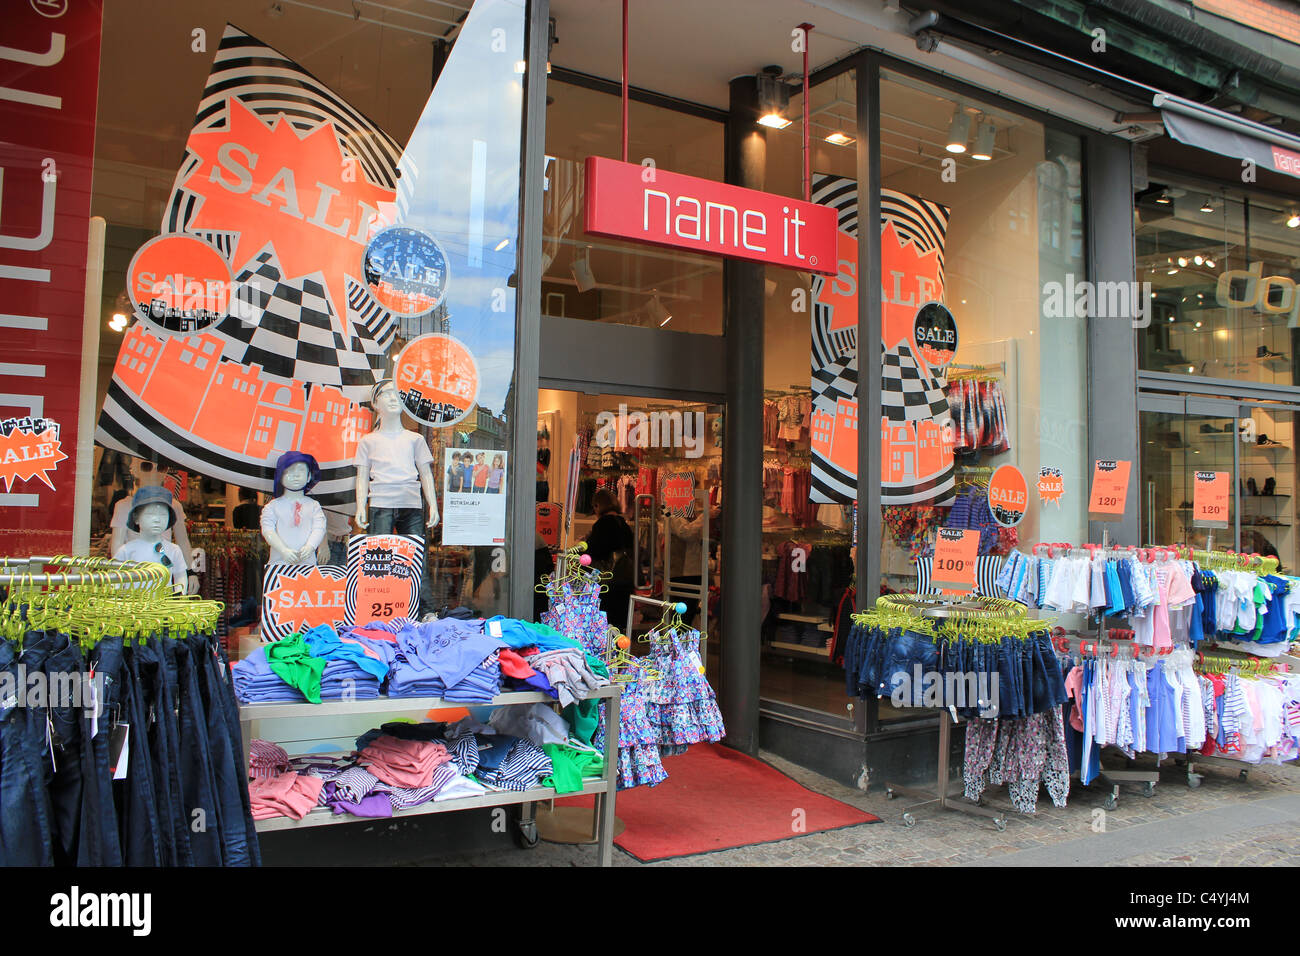 Baby Clothes Shop Immagini   Baby Clothes Shop Fotos Stock - Alamy 3c7eec80698